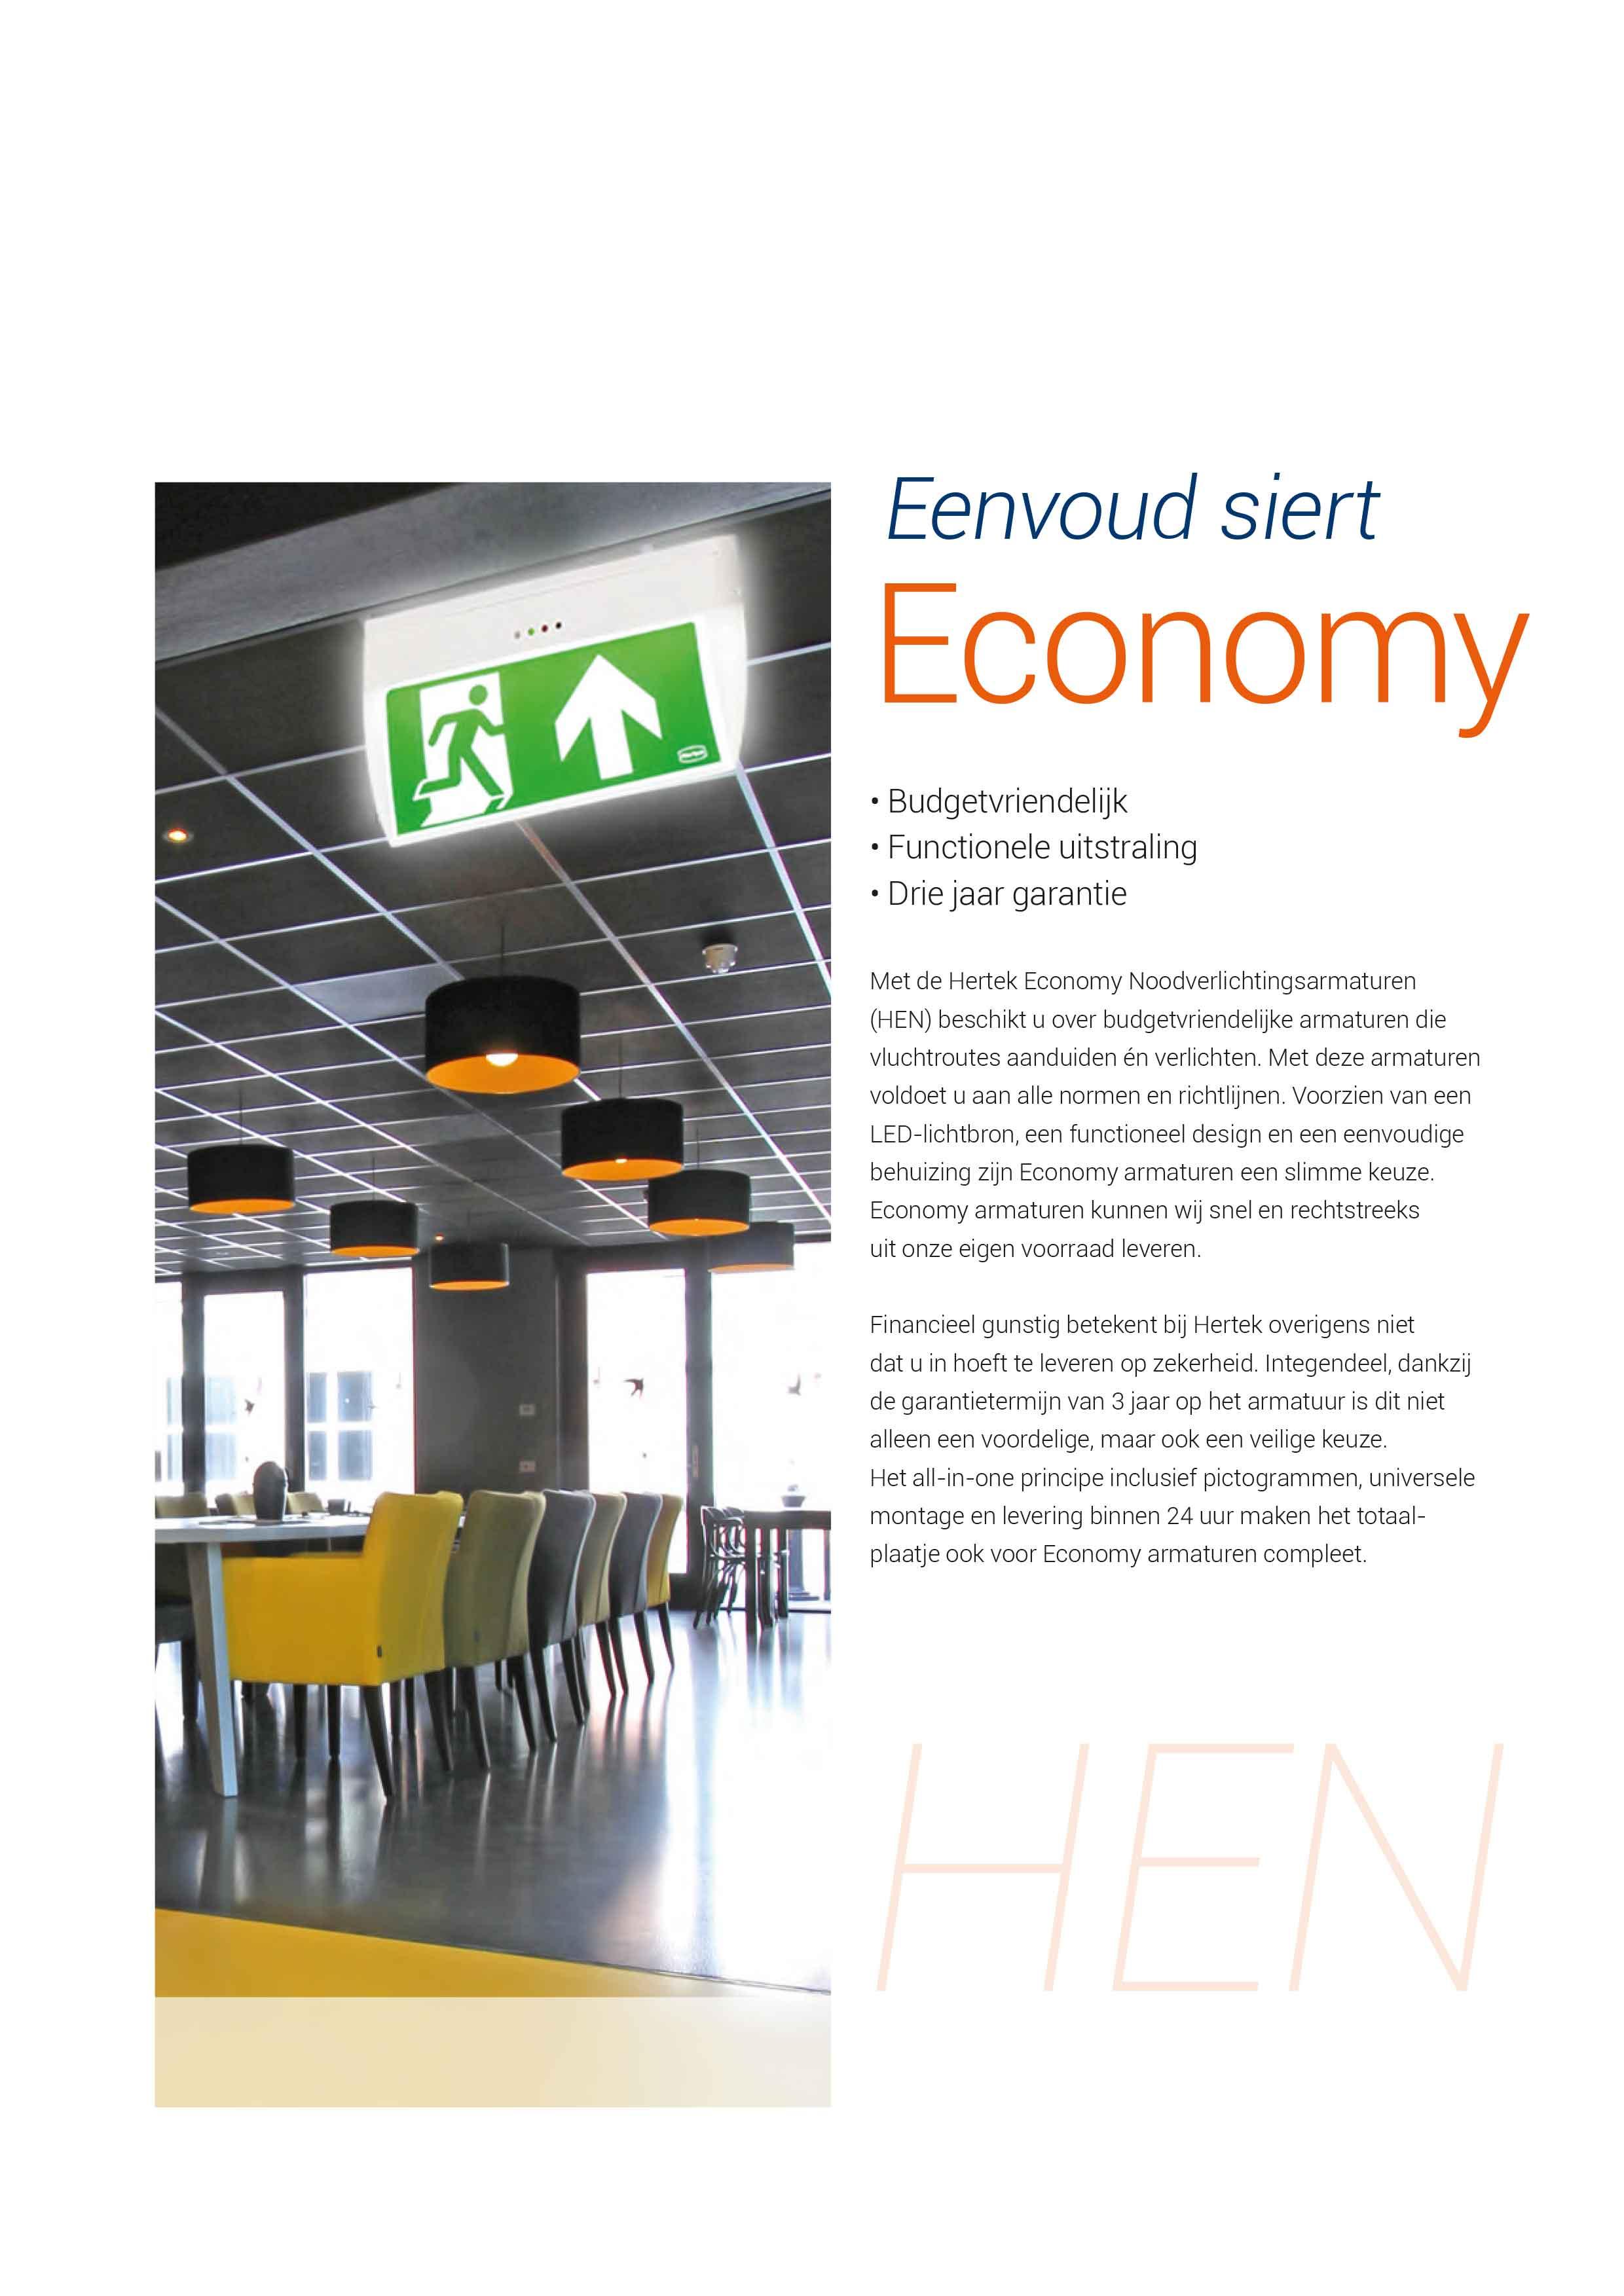 economy-noodverlichting-hoofdpagina